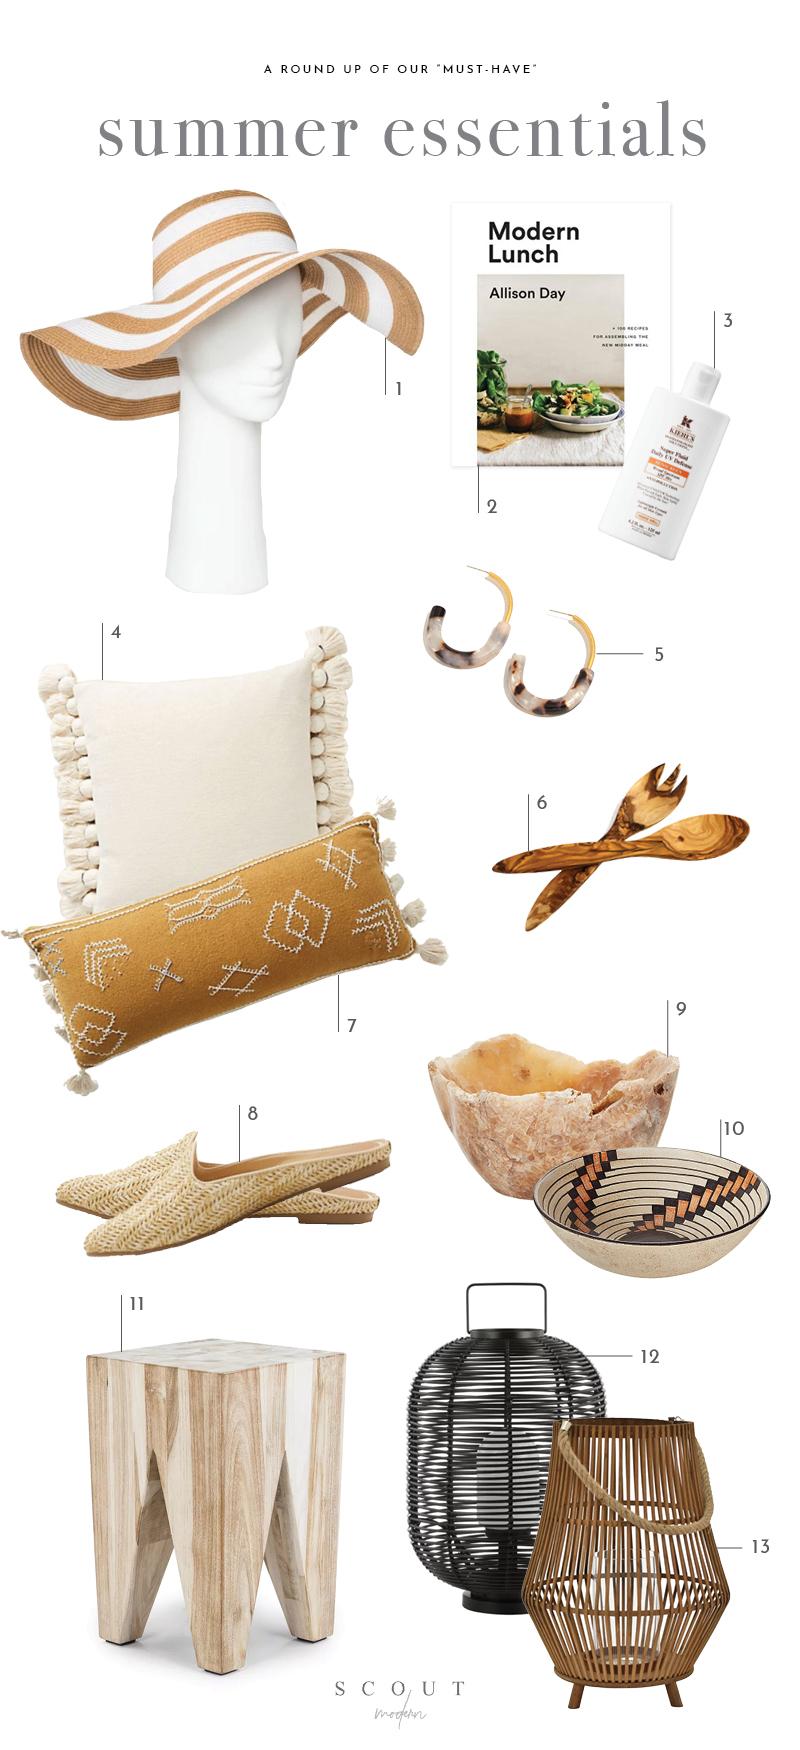 1.  Floppy Hat  | 2.  Modern Lunch  | 3.  Sunscreen  | 4.  Cream Tassel Pillow  | 5.  Tortoiseshell Earrings  | 6.  Salad Servers  | 7.  Mustard Embroidered Pillow  | 8.  Woven Mules  | 9.  Onyx Serving Bowl  | 10.  Porta Ceramic Serving Bowl  | 11.  Tana Stool  | 12.  Black Lantern  | 13.  Natural Lantern